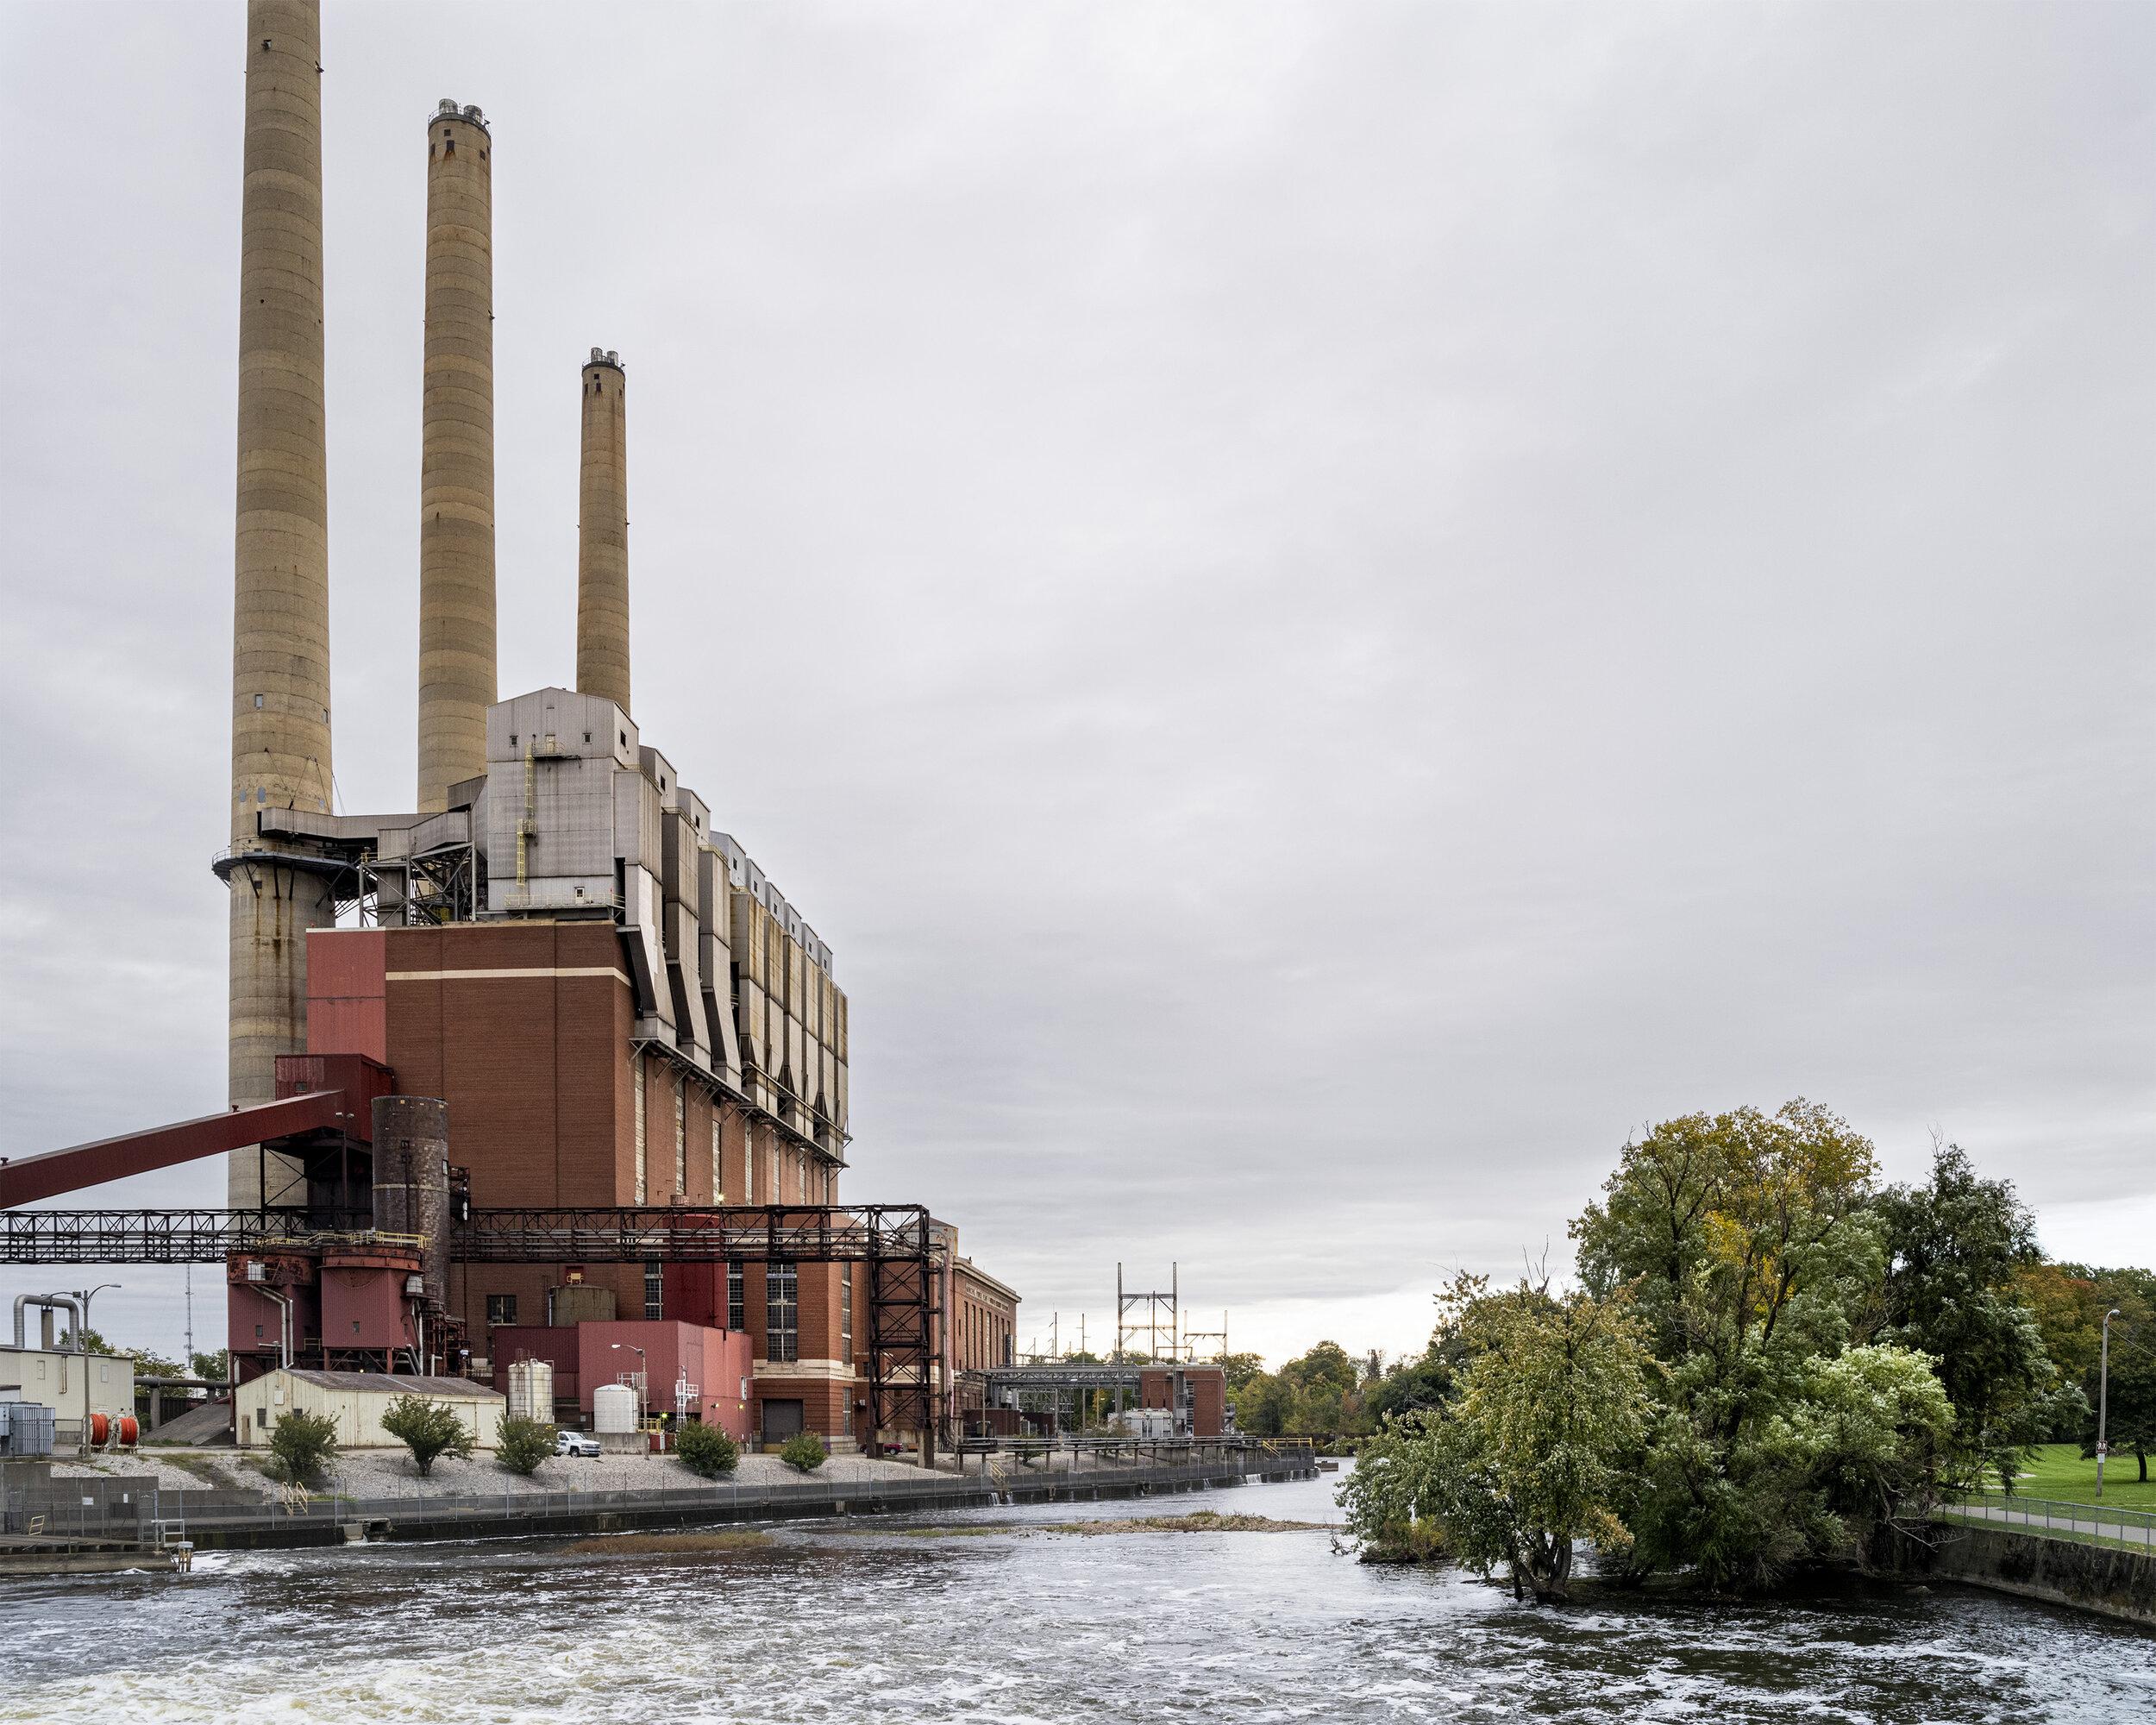 Otto C. Eckert Municipal Power Plant, Lansing